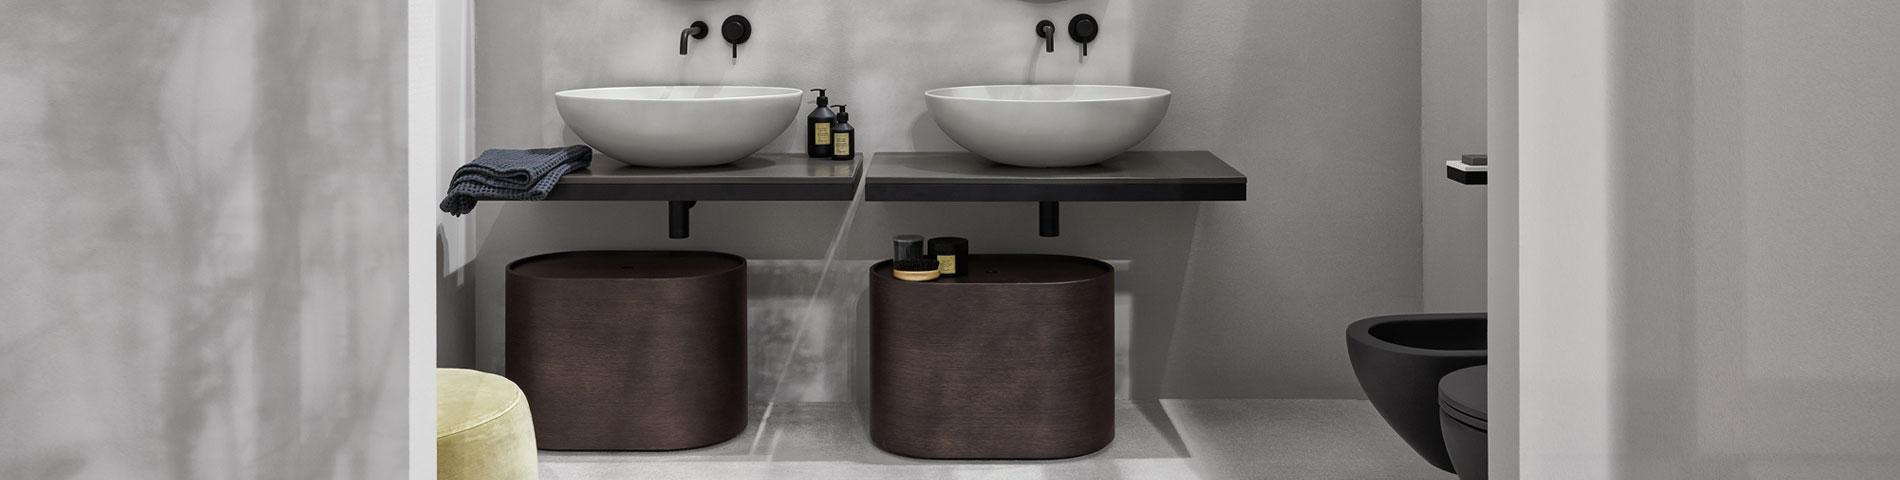 Sanitari Ceramica Cielo Prezzi.Tipologie Sanitari Arredo Bagno Di Design Ceramica Cielo S P A